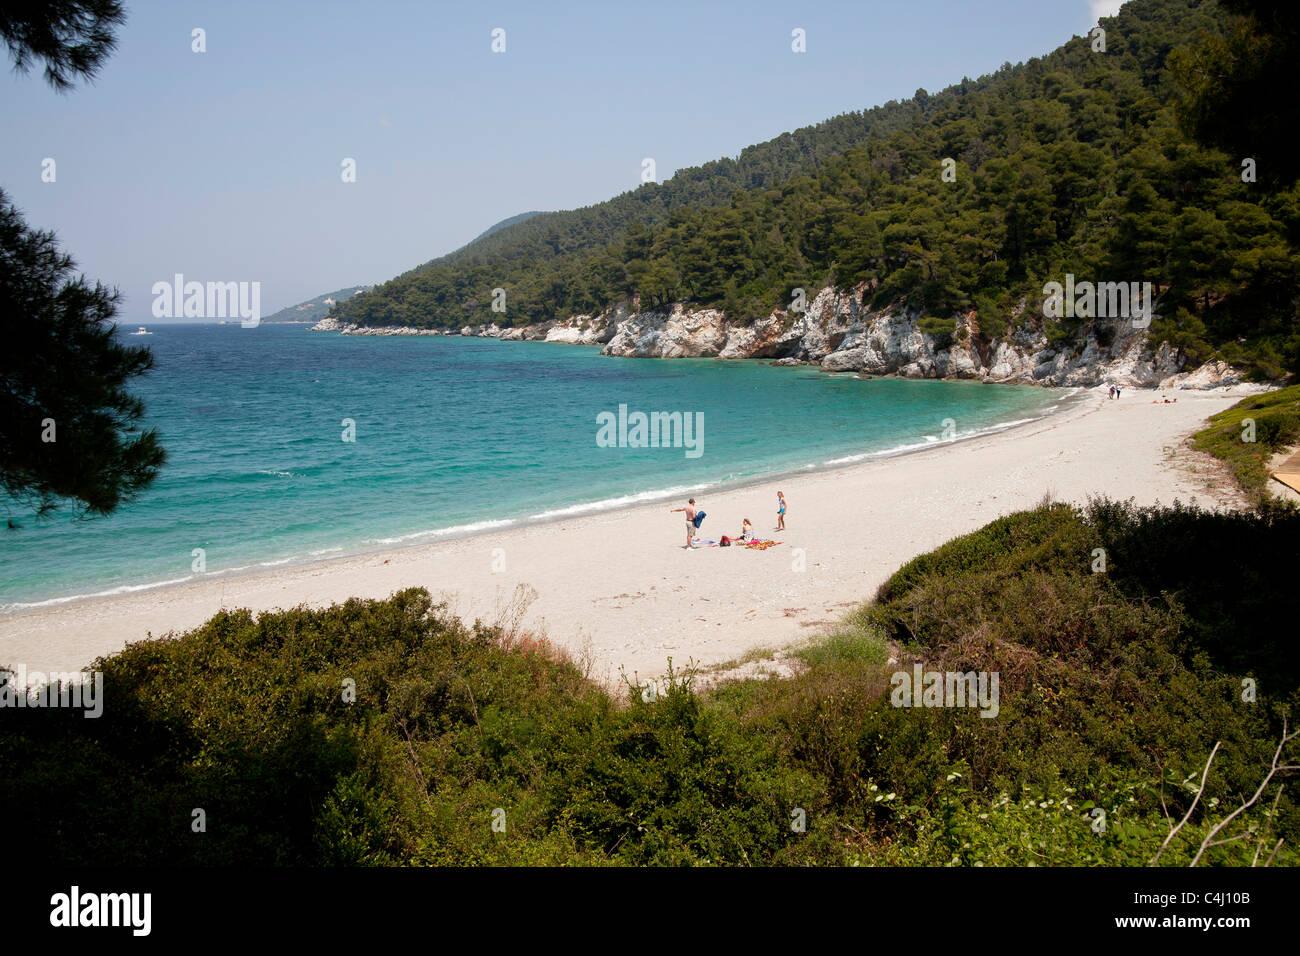 gialos kastani beach and bay mamma mia movie location on skopelos stock photo 37275291 alamy. Black Bedroom Furniture Sets. Home Design Ideas